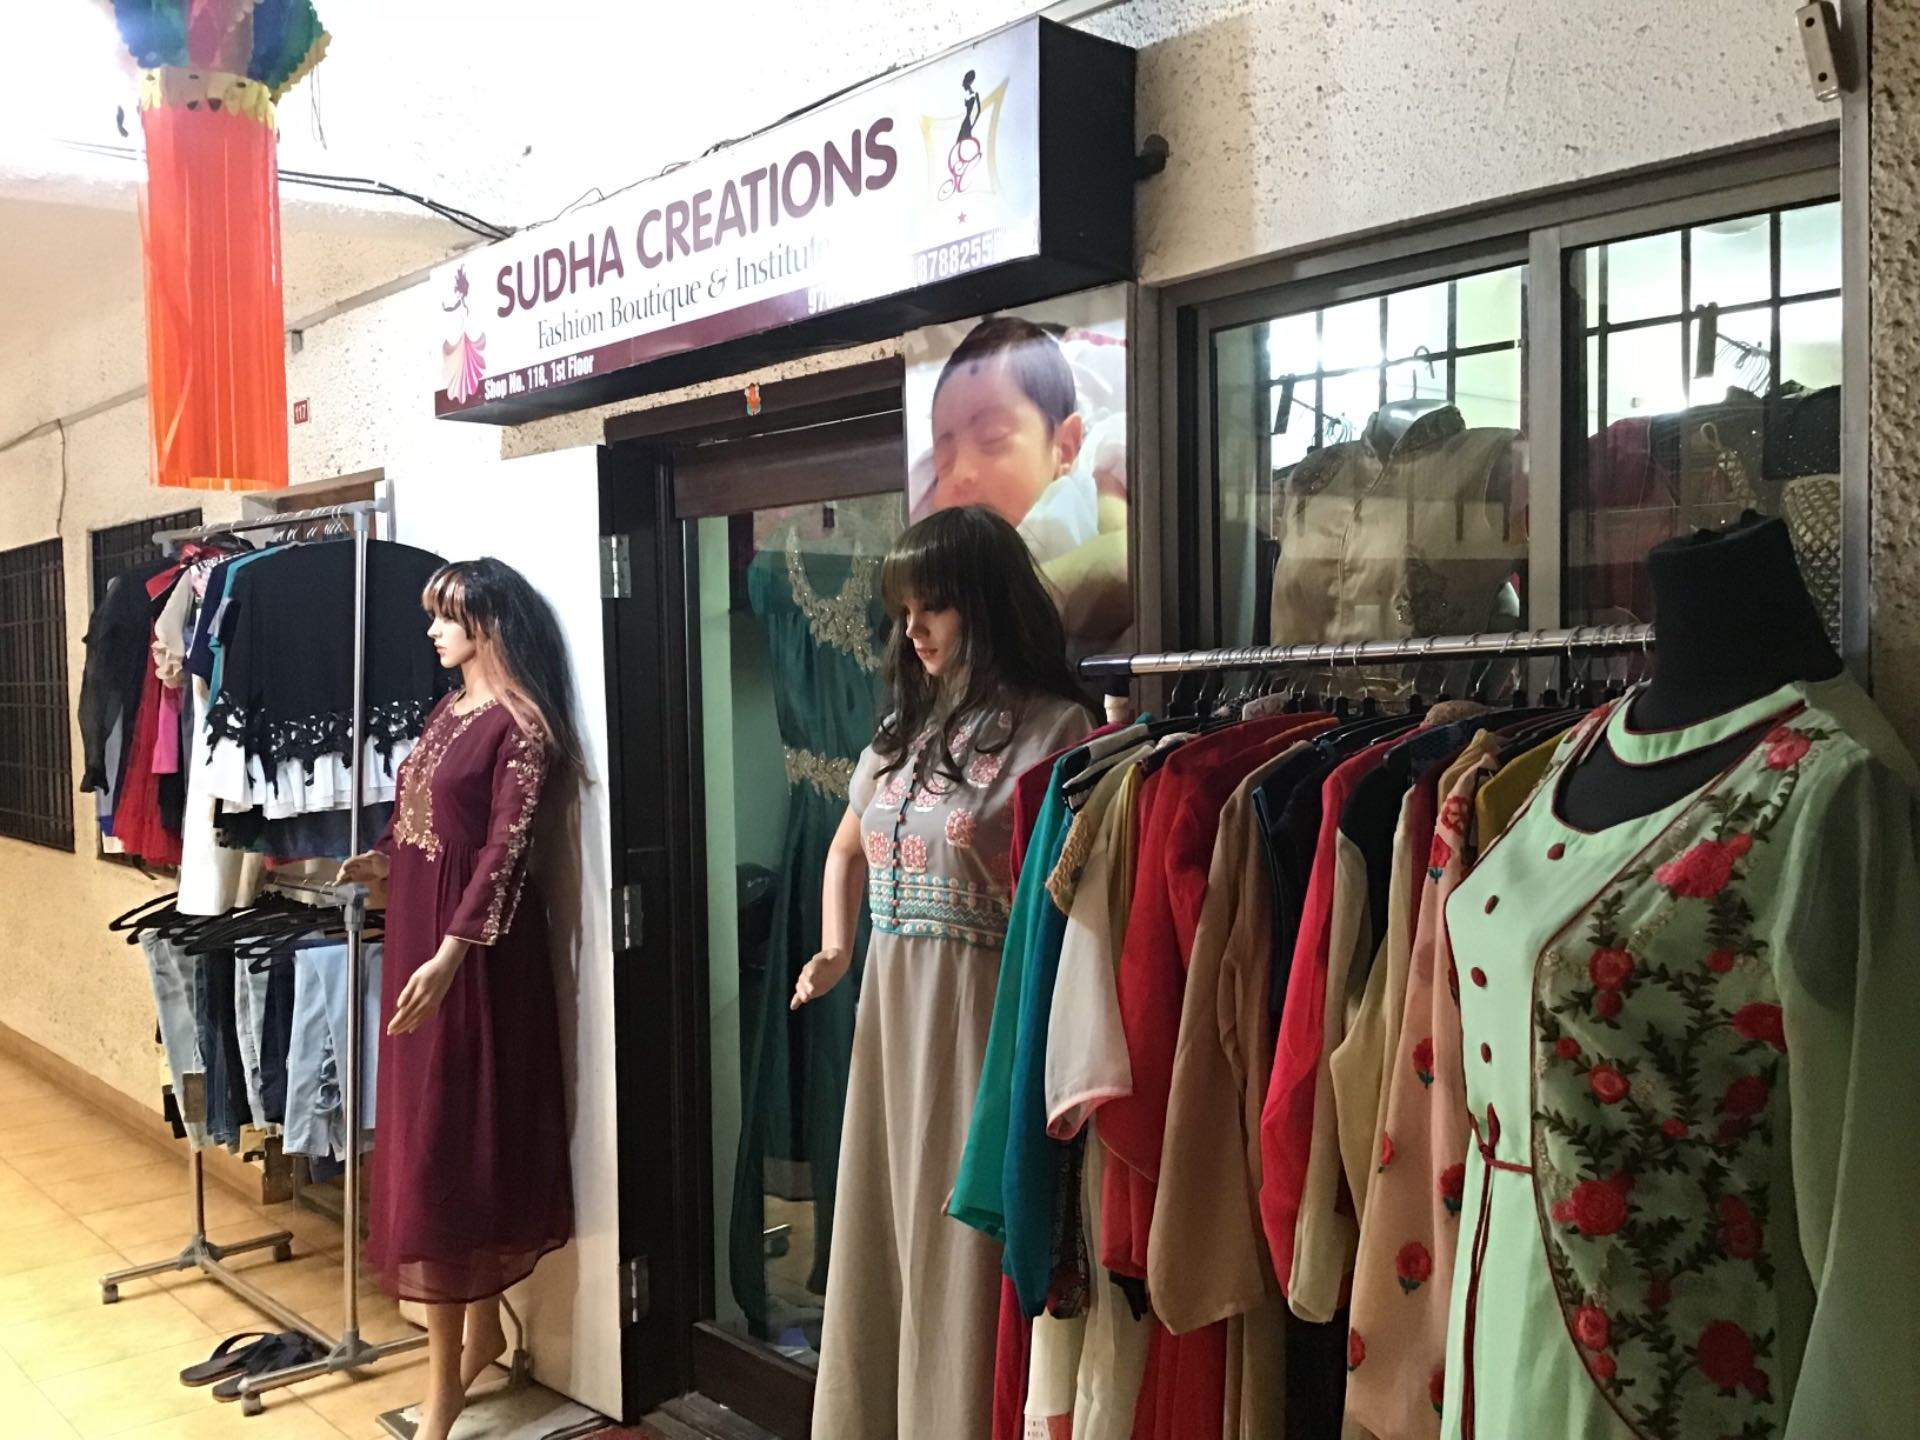 Sudha Creation Boutique And Fashion Institutes Ponda Computer Training Institutes In Goa Justdial